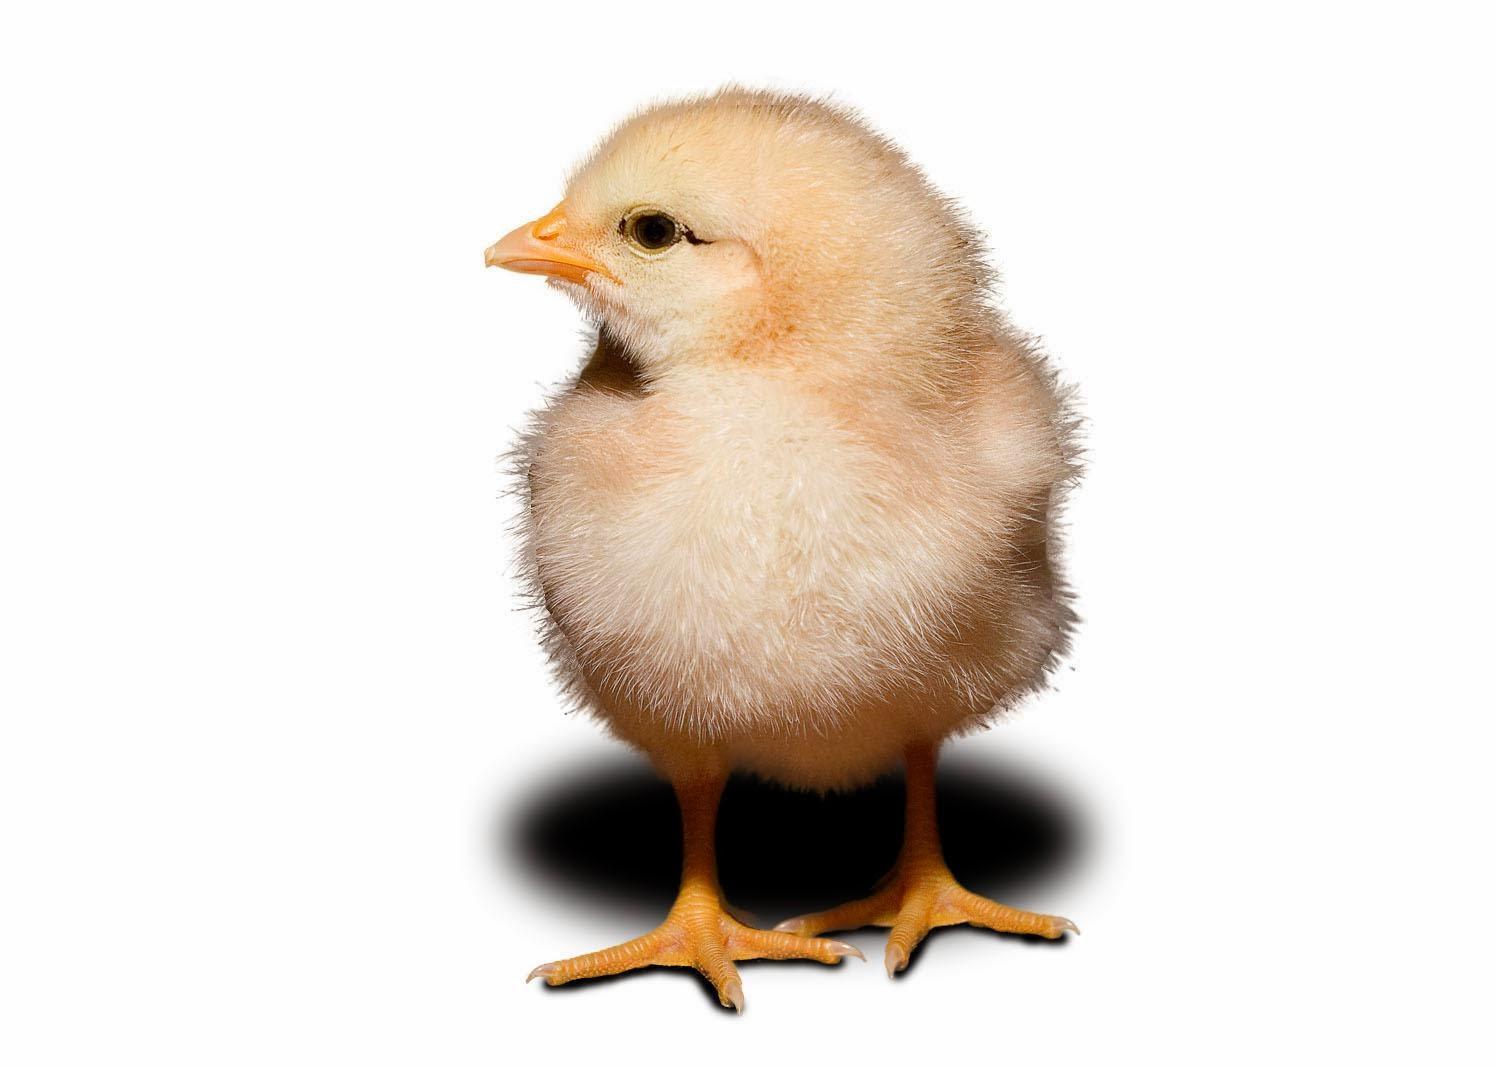 chicks chick wallpapers hd 4u wallpapersafari code